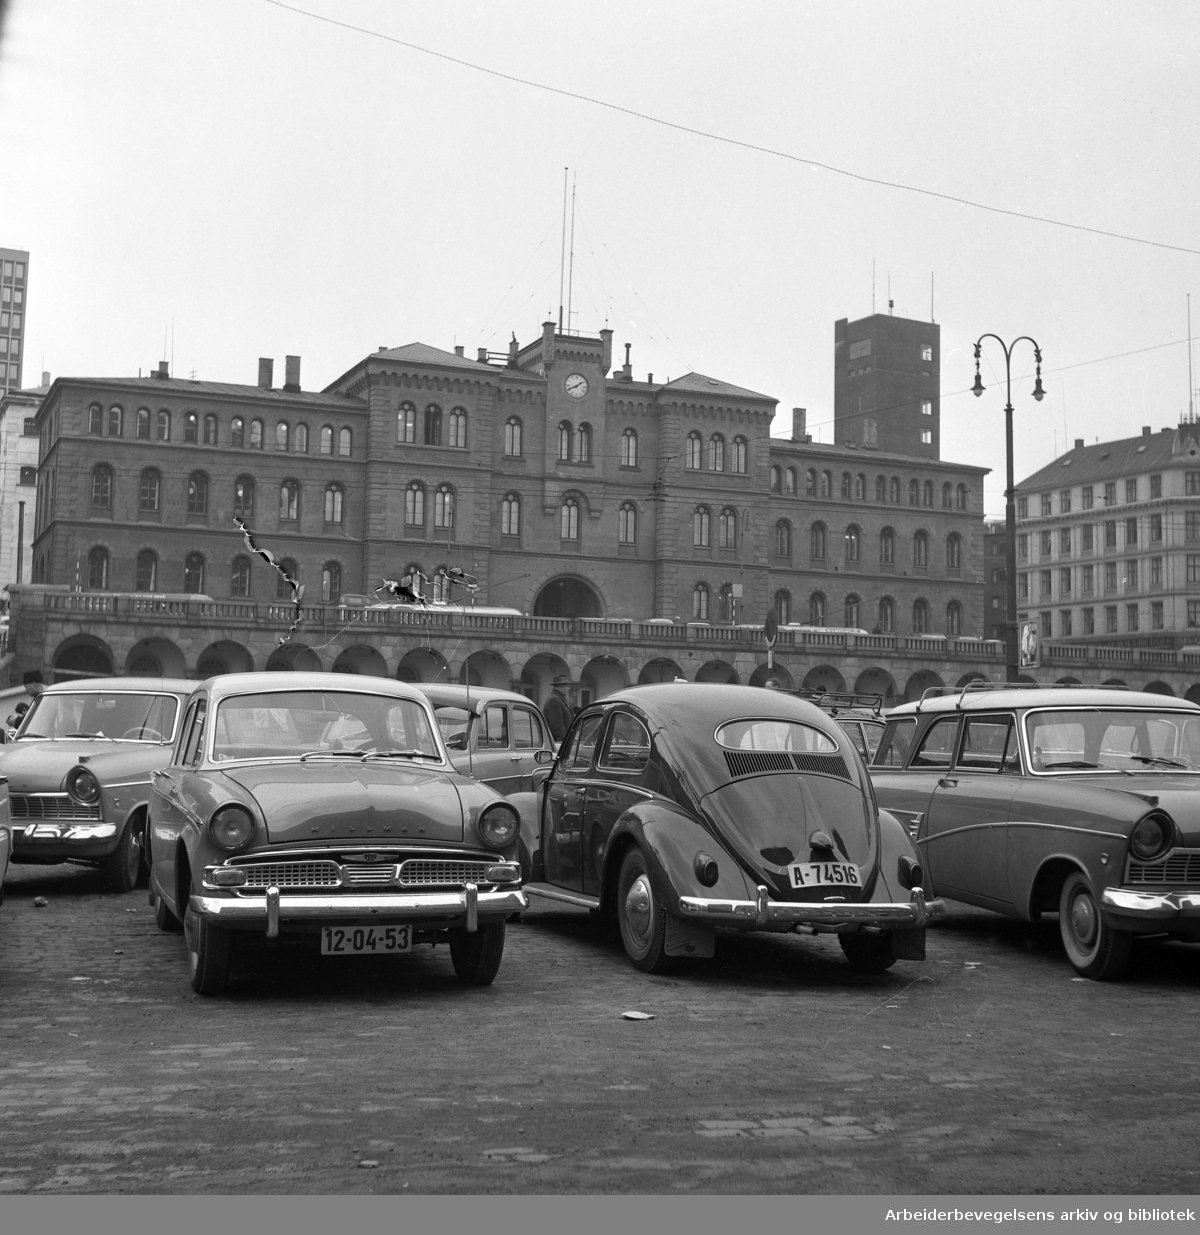 Møllergaten 19, Youngstorget, ca. 1965 - 1966.